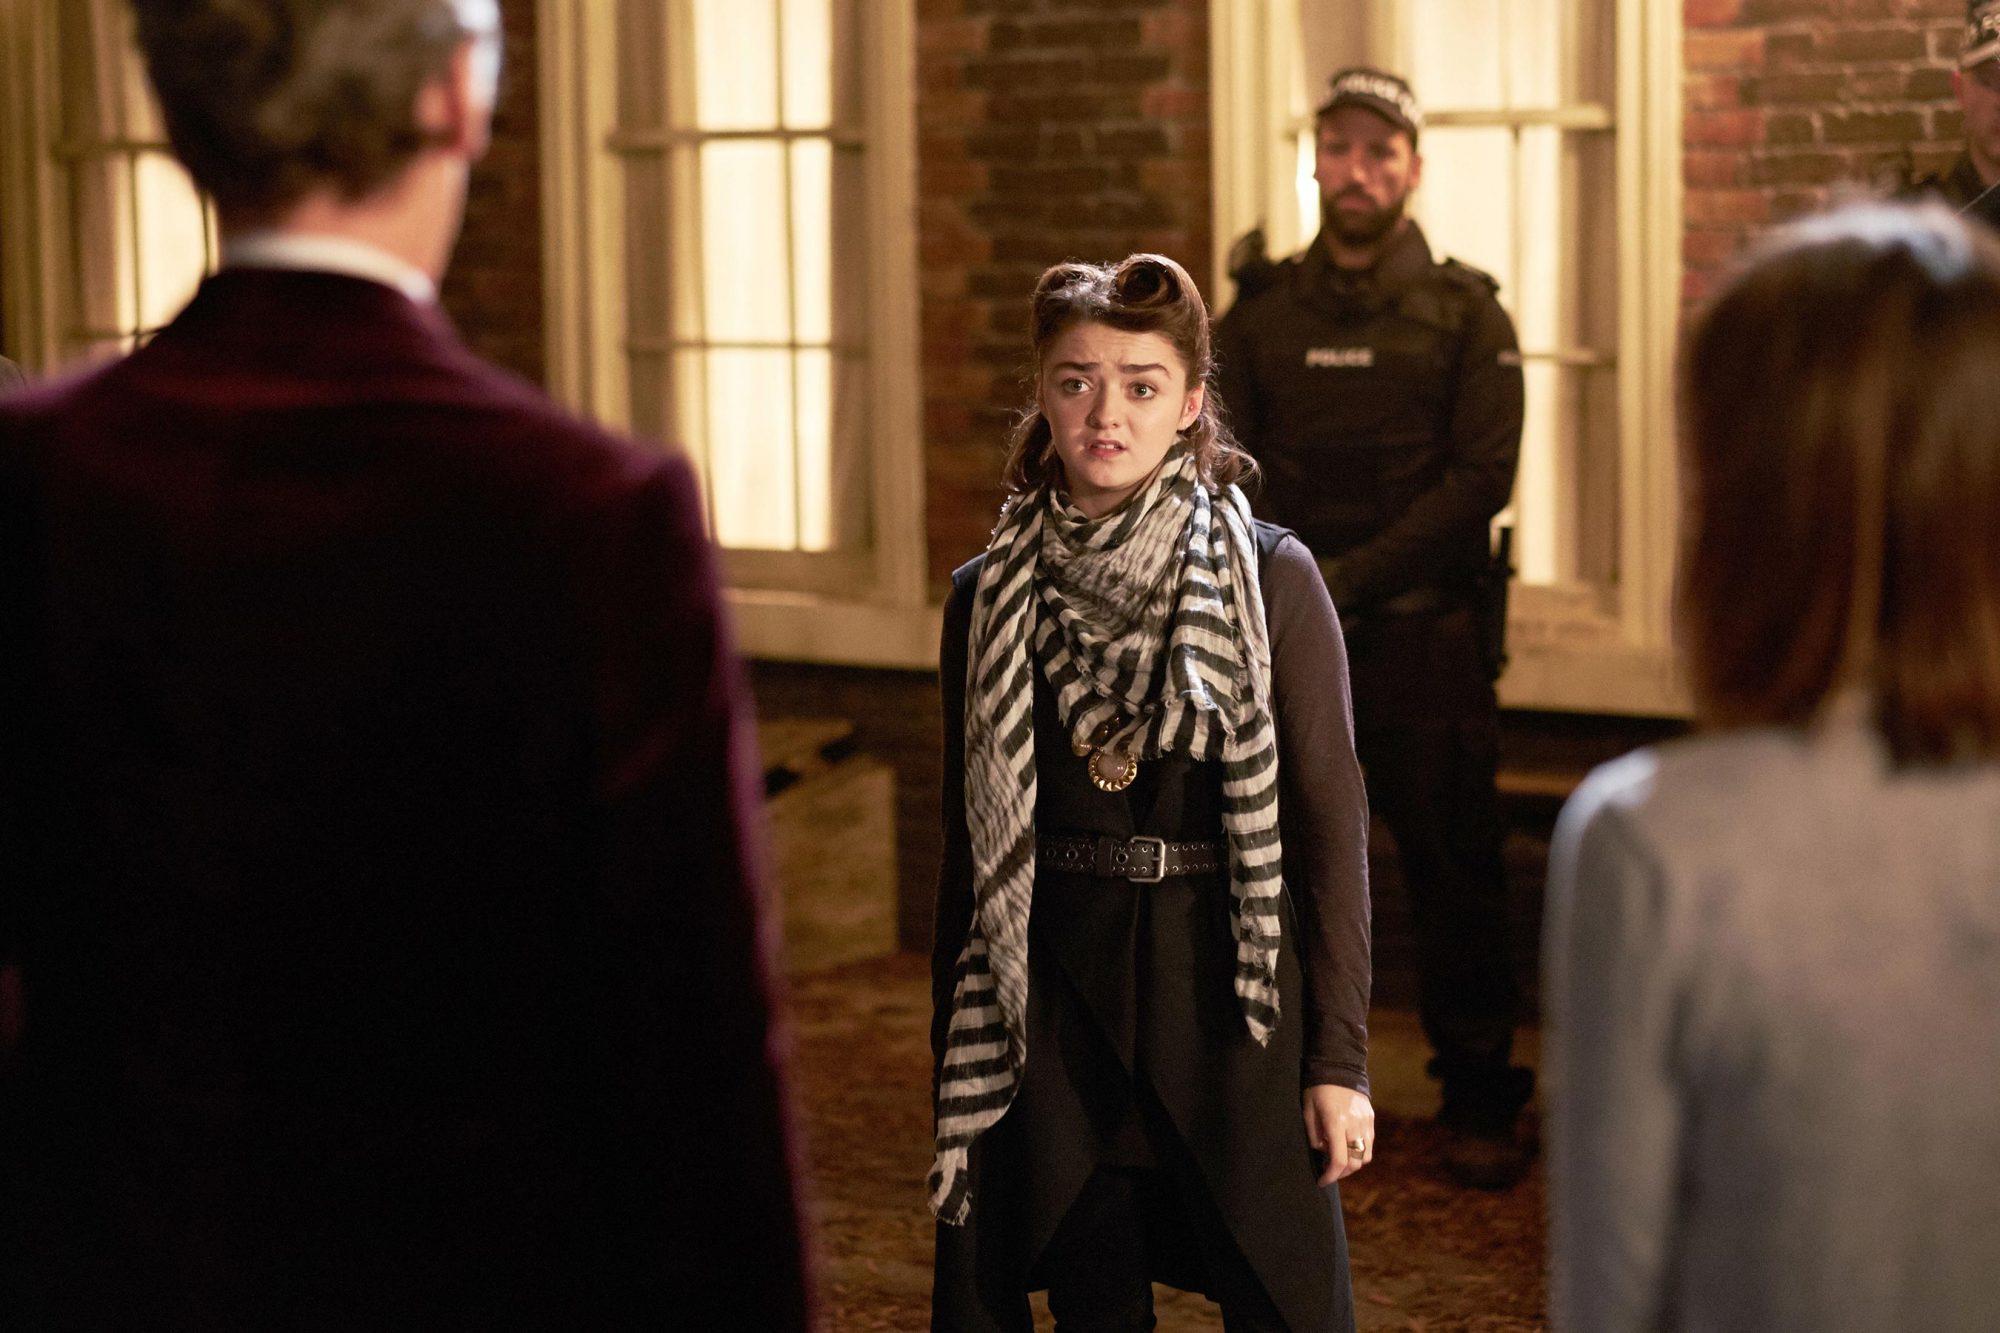 DOCTOR WHO, Maisie Williams (center), 'Face The Raven', (Season 9, ep. 910, aired Nov. 21, 2015).